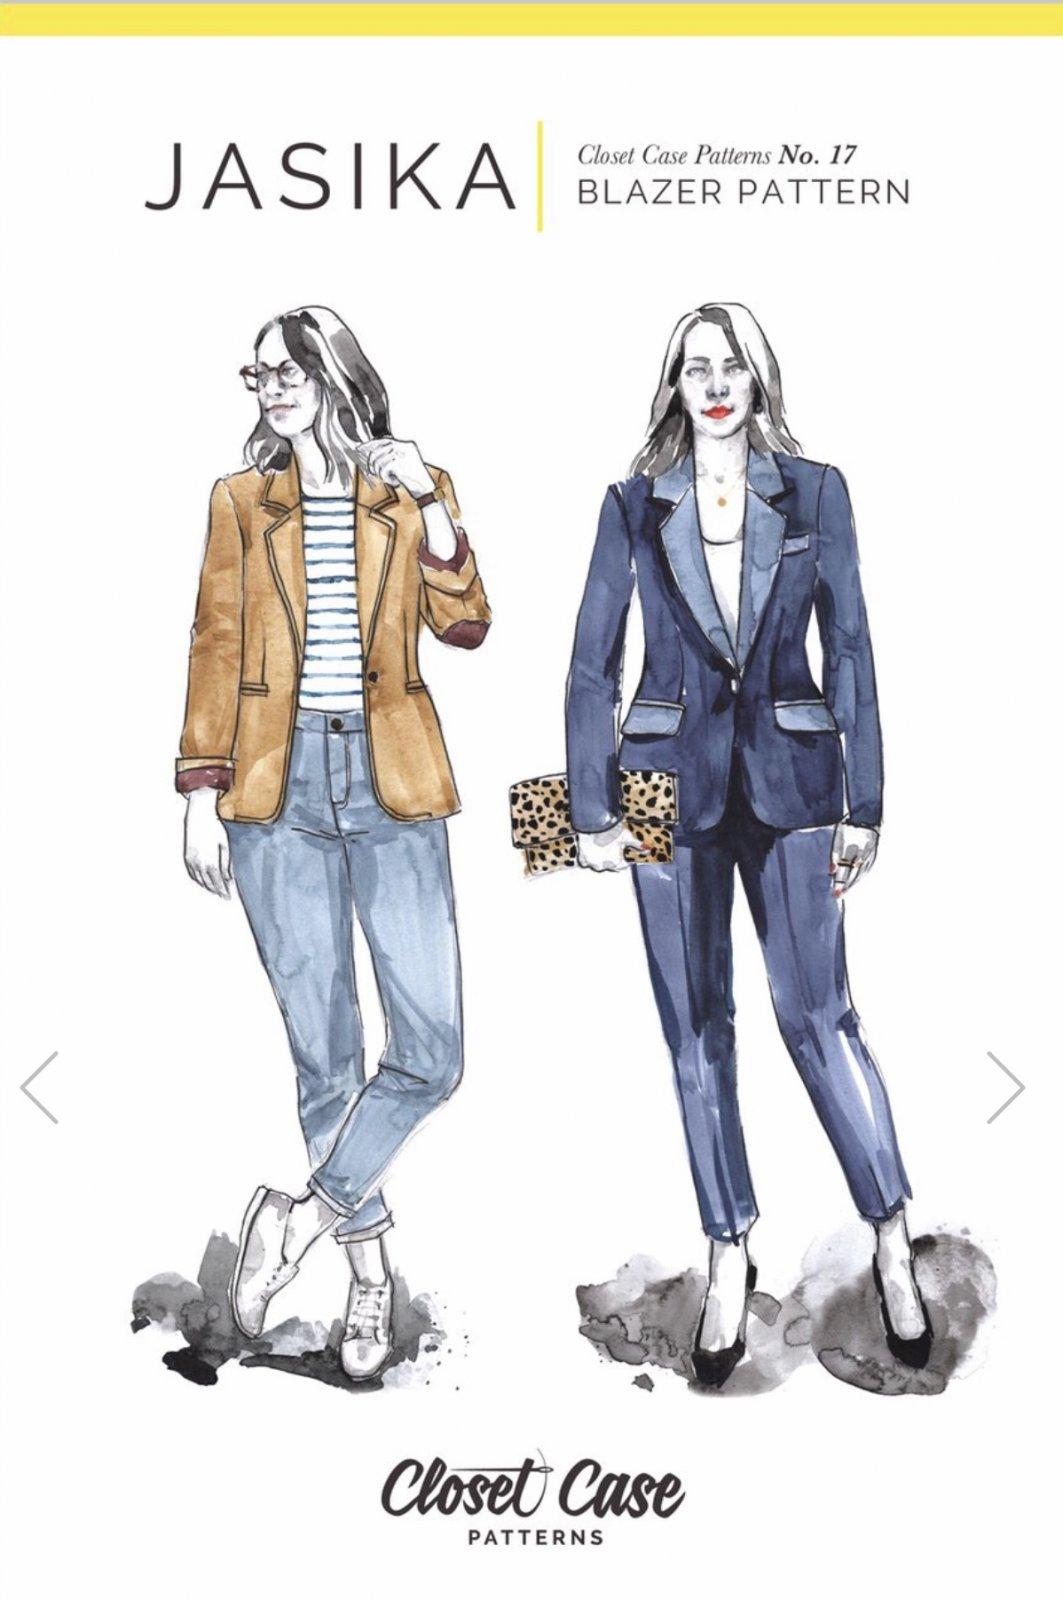 Closet Case - Jasika Blazer Pattern